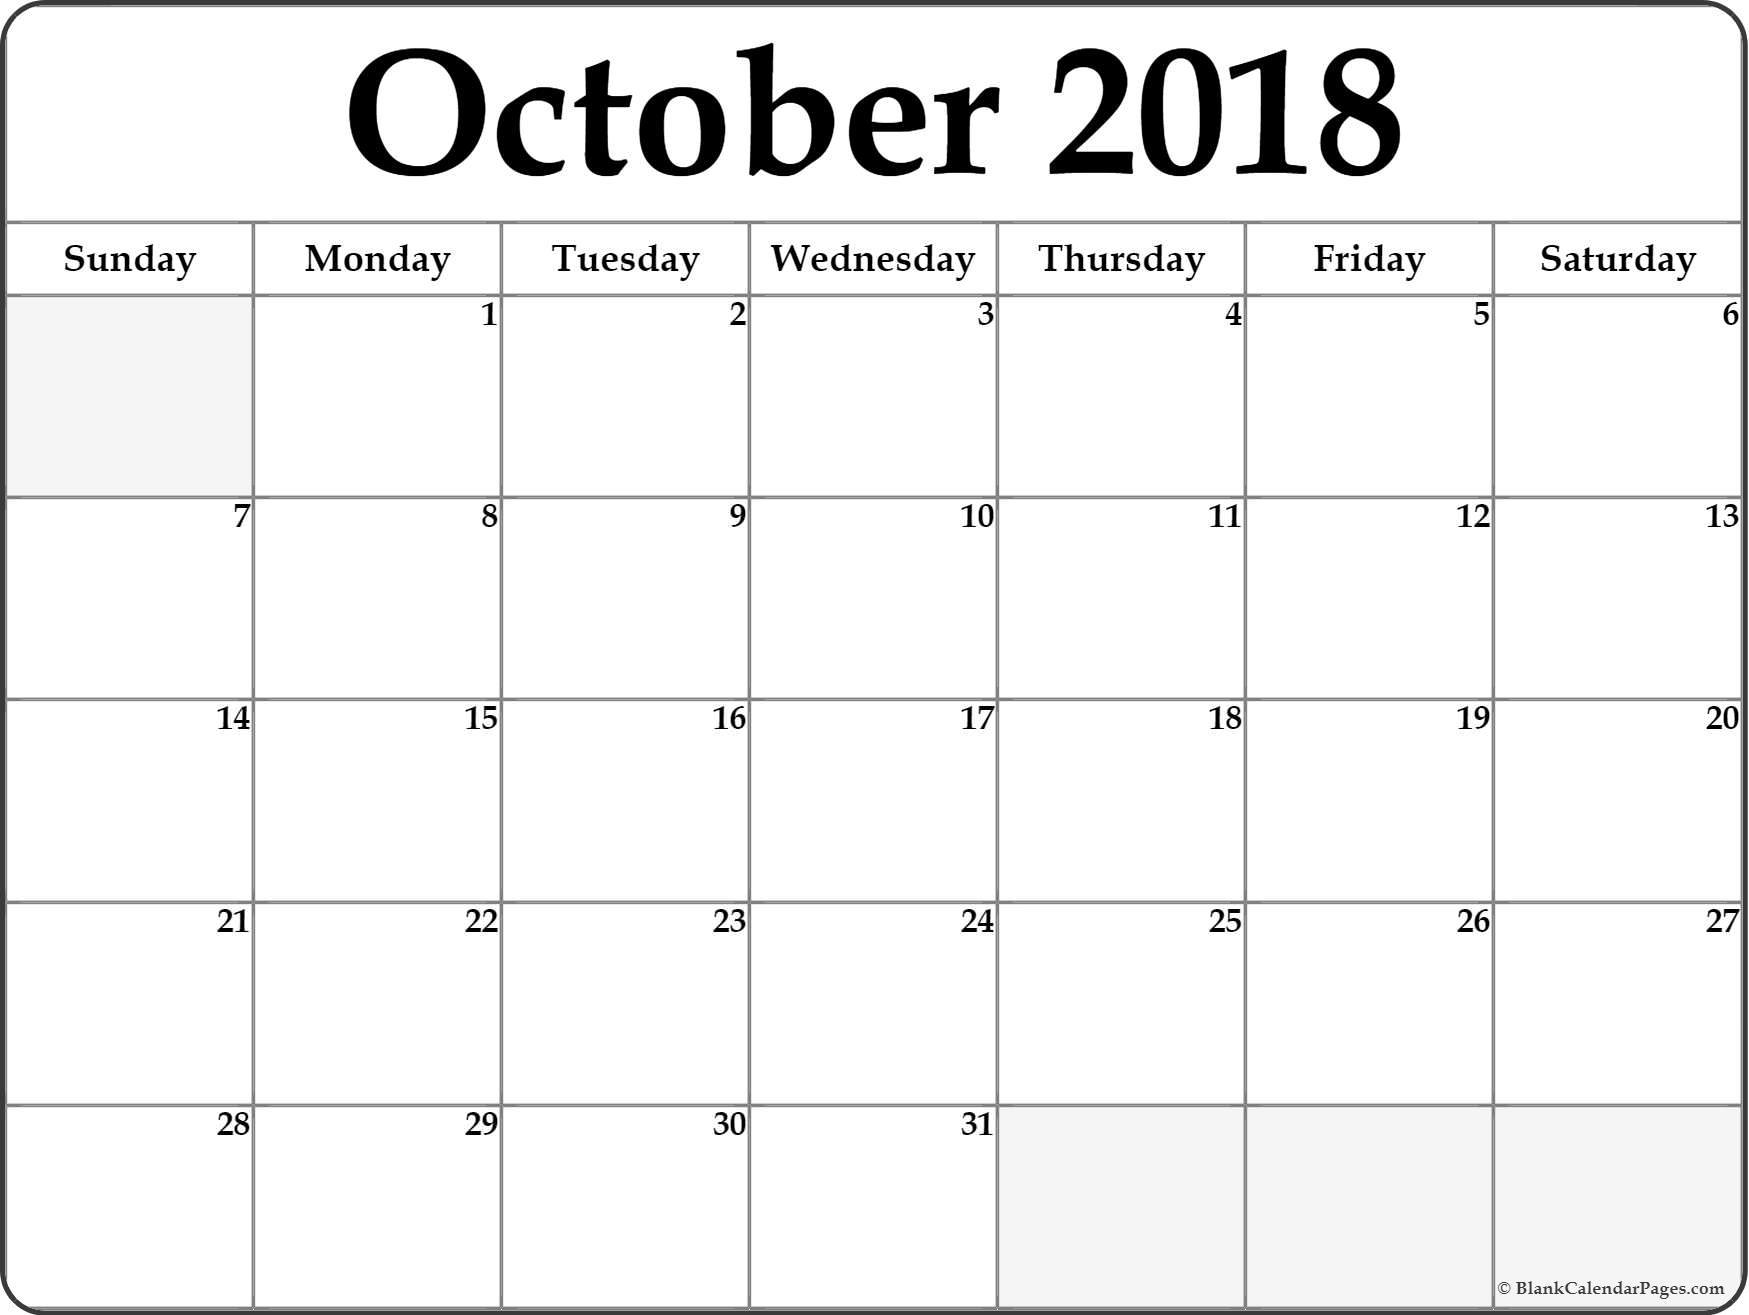 October 2018 Calendar Printable Free